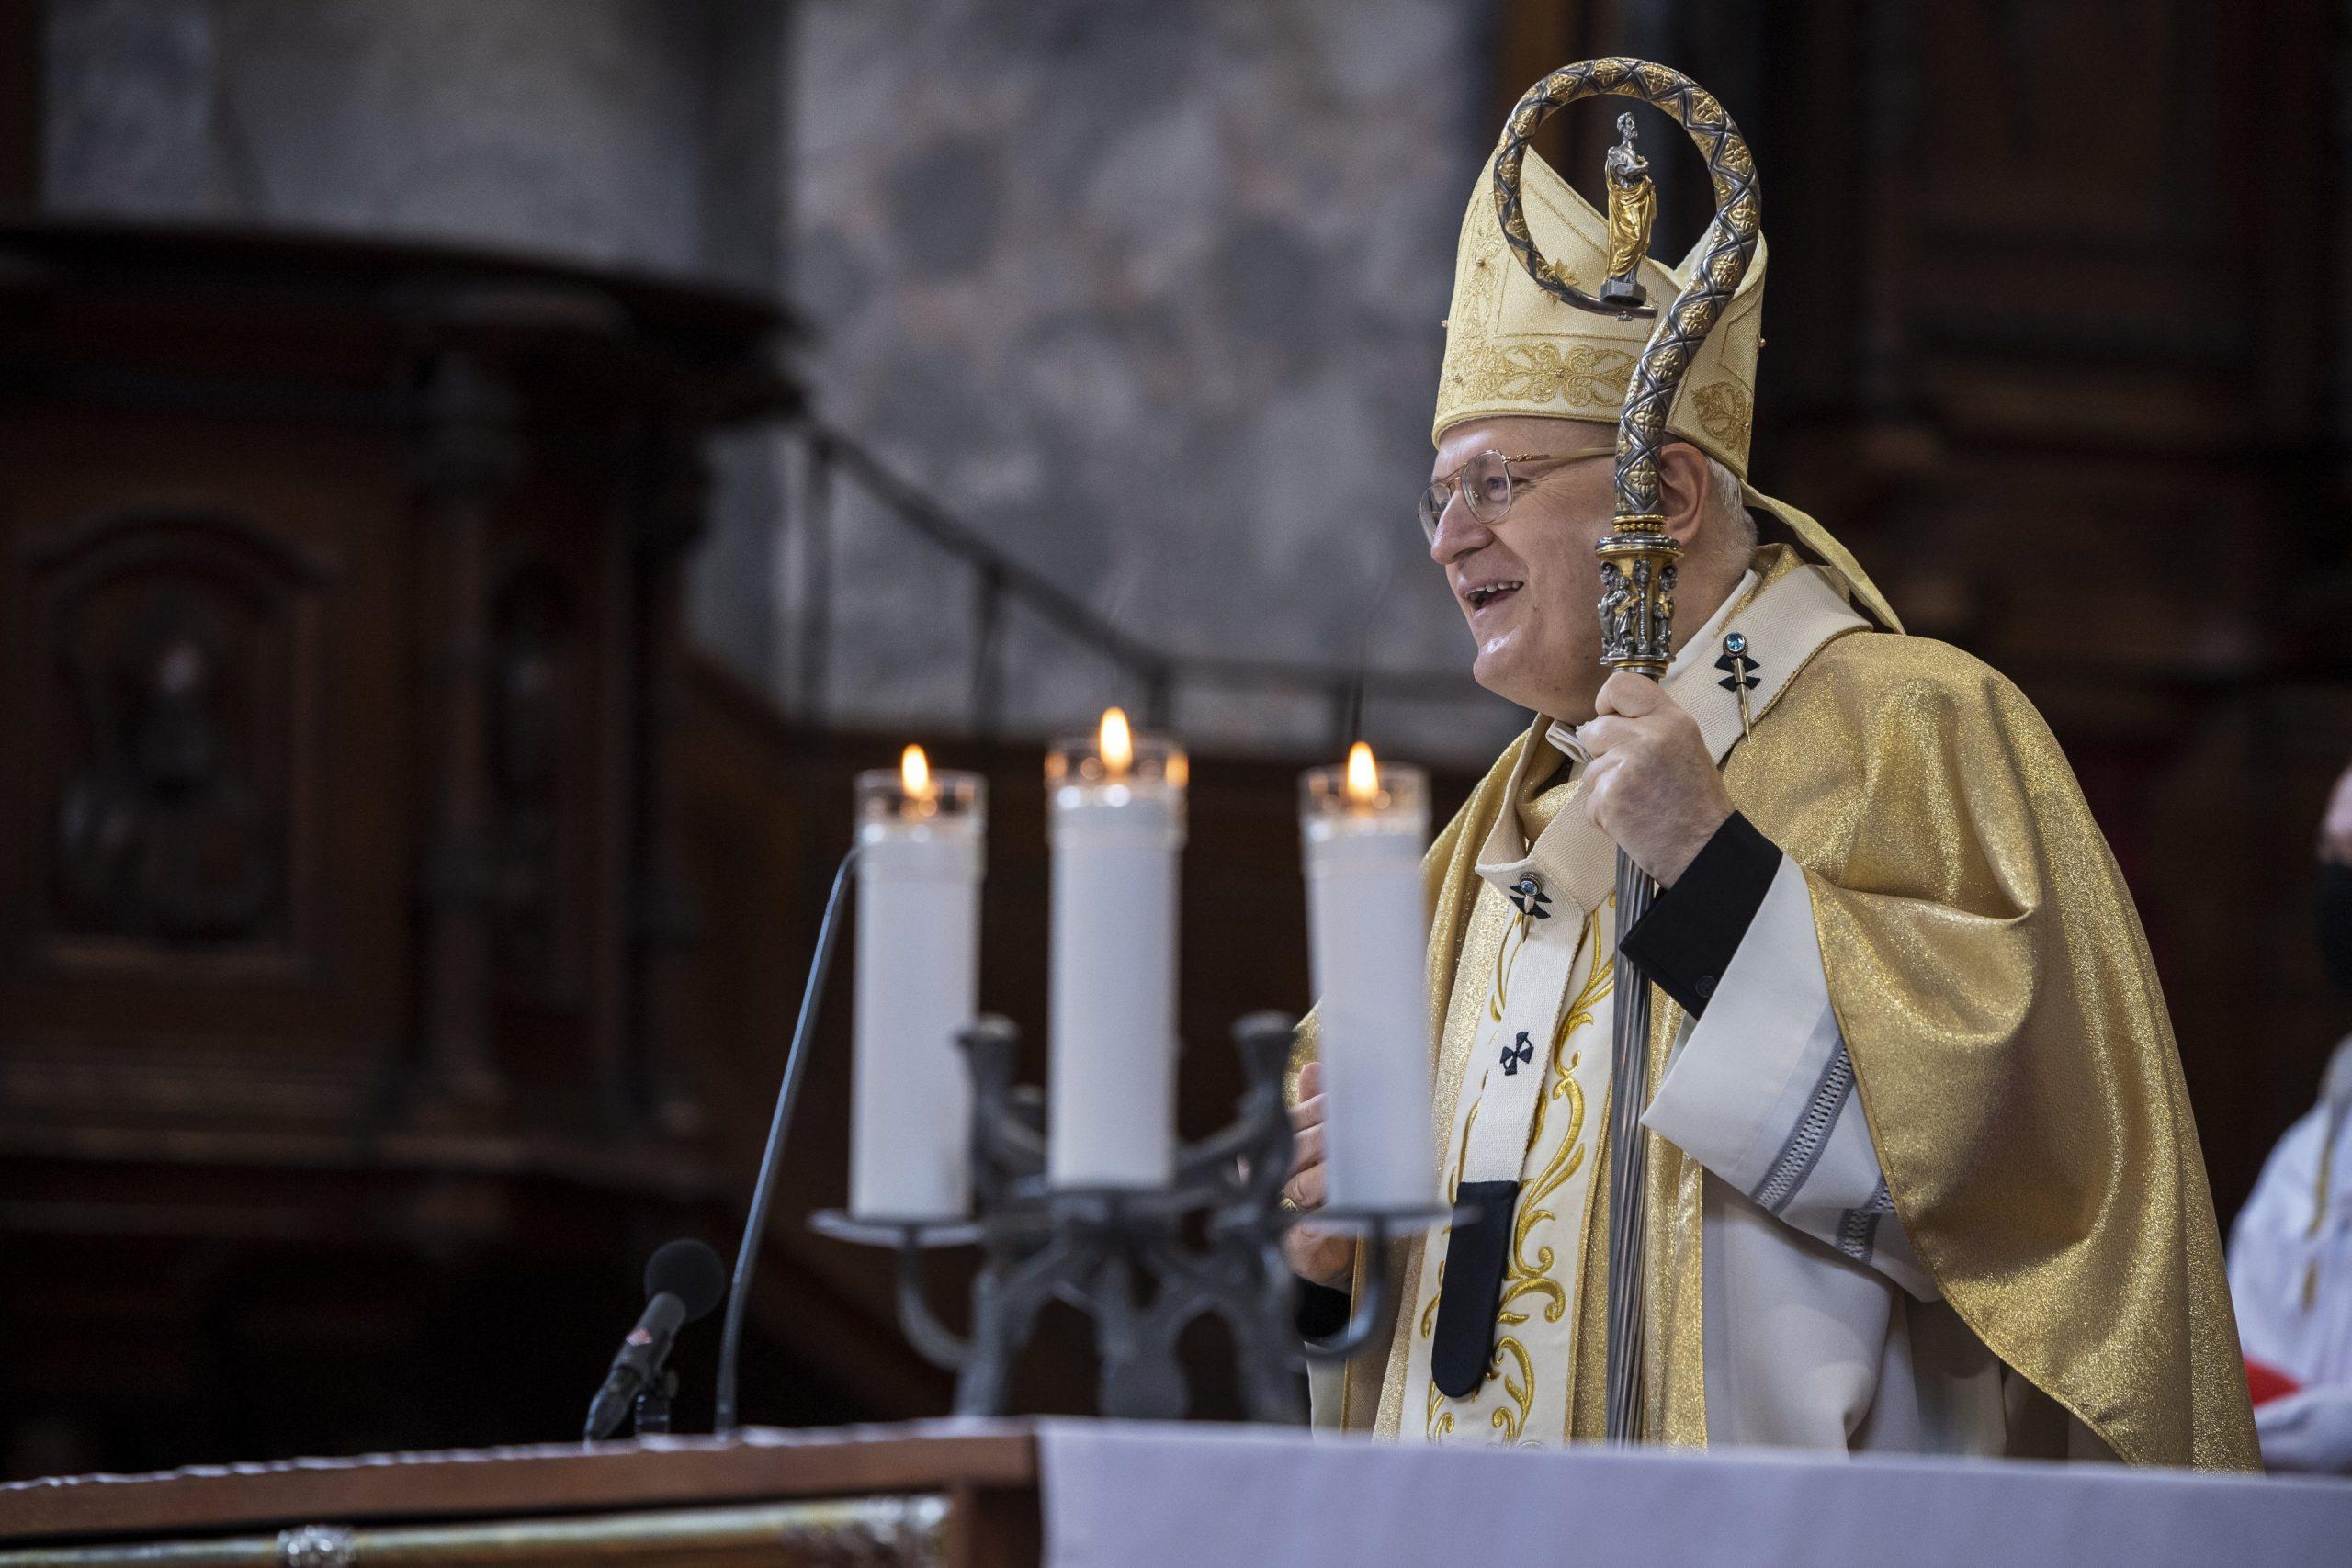 Cardinal Erdő: 1.2 Billion Catholics on Five Continents 'Watching Us'